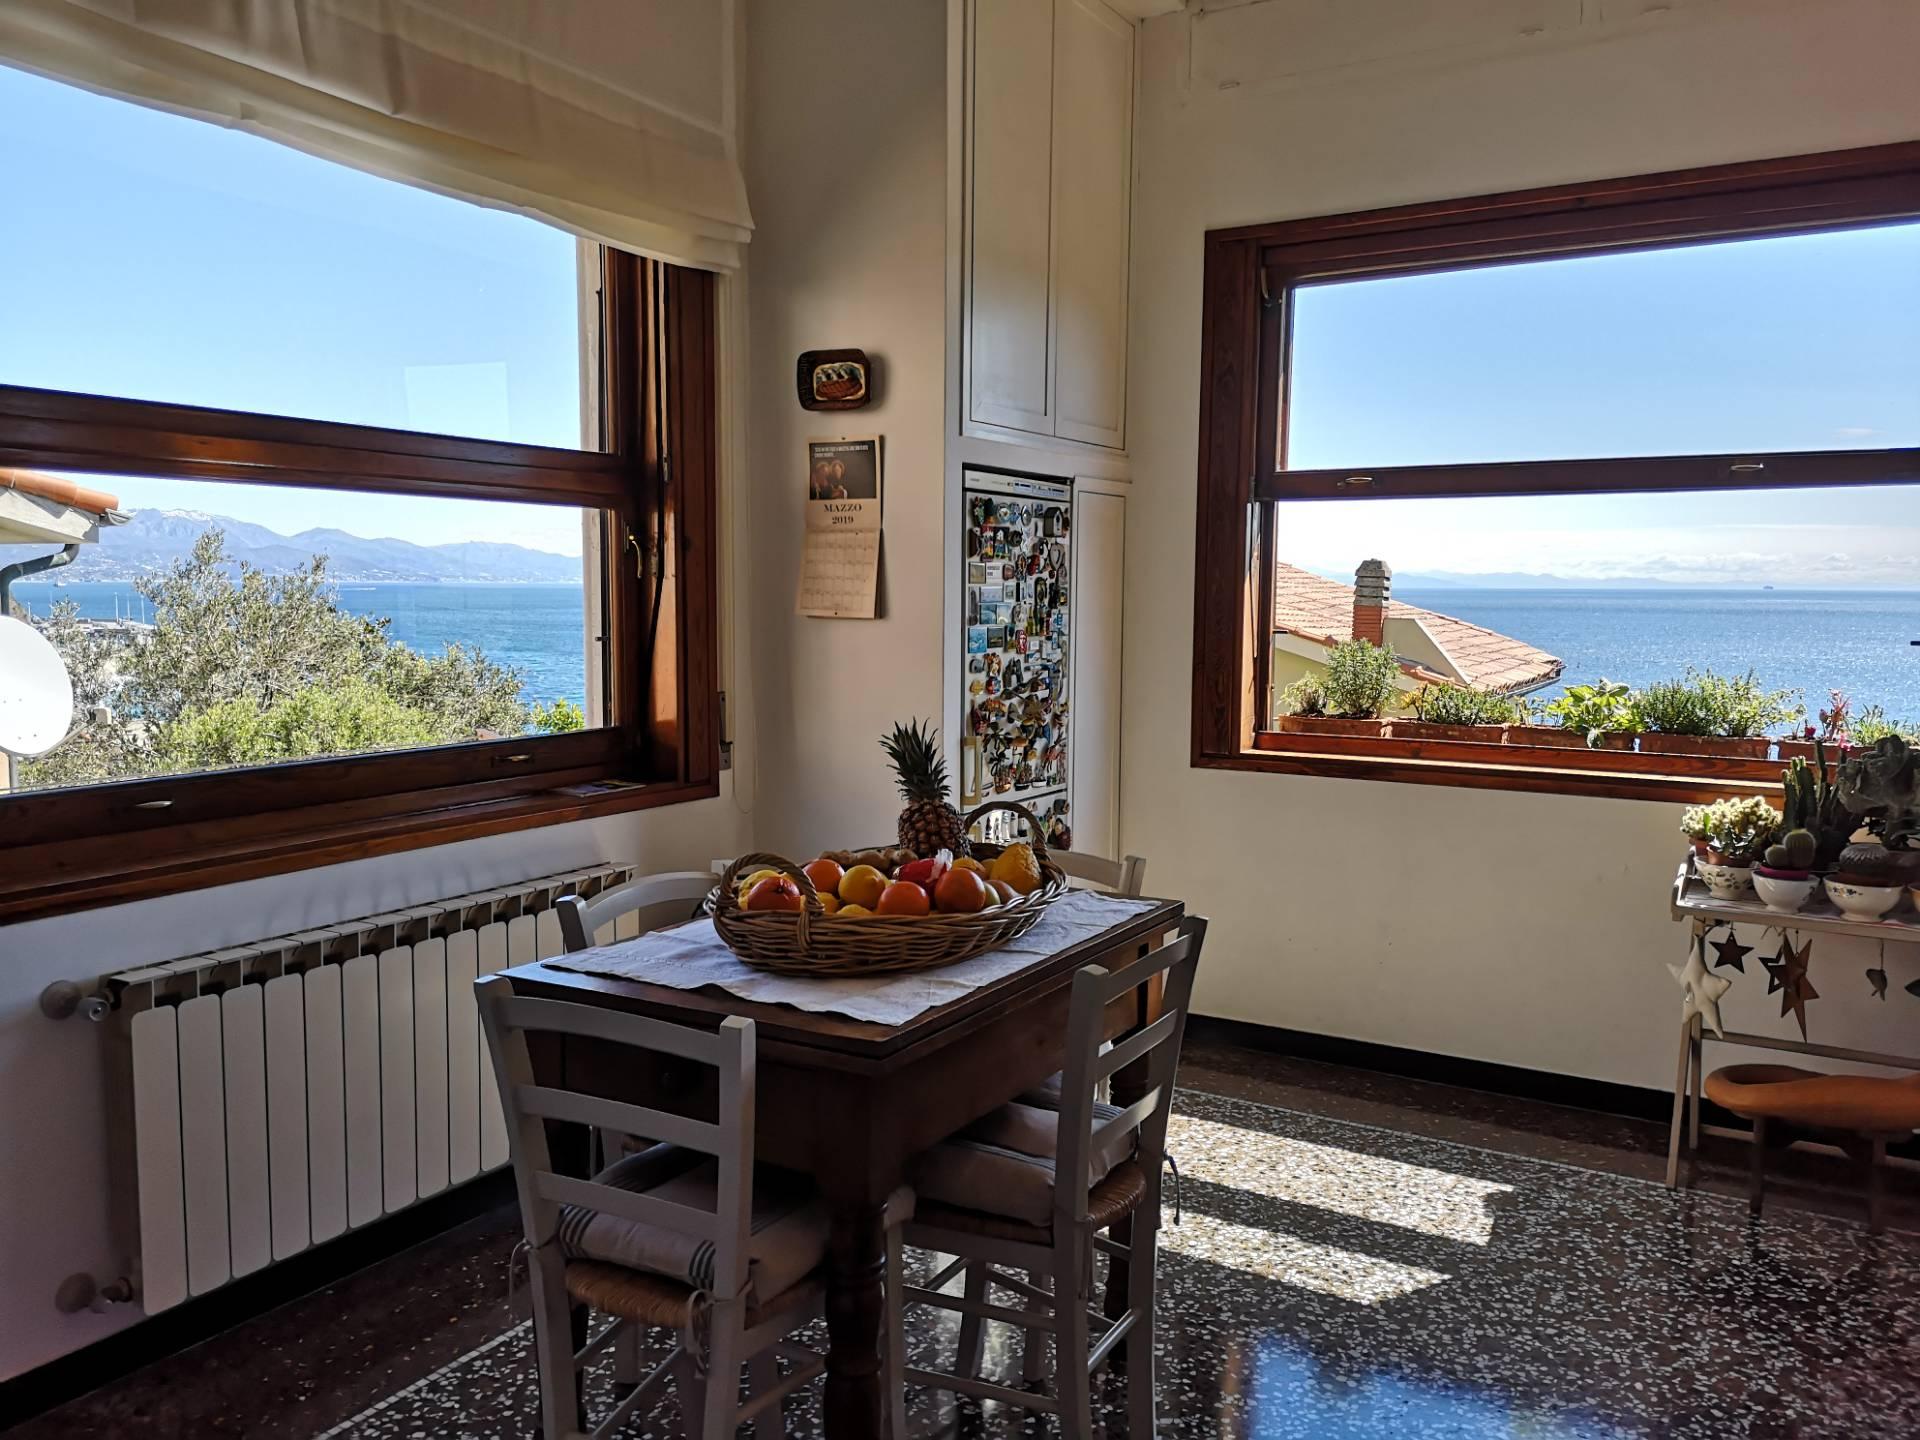 Appartamento in vendita Via Mede Bergeggi